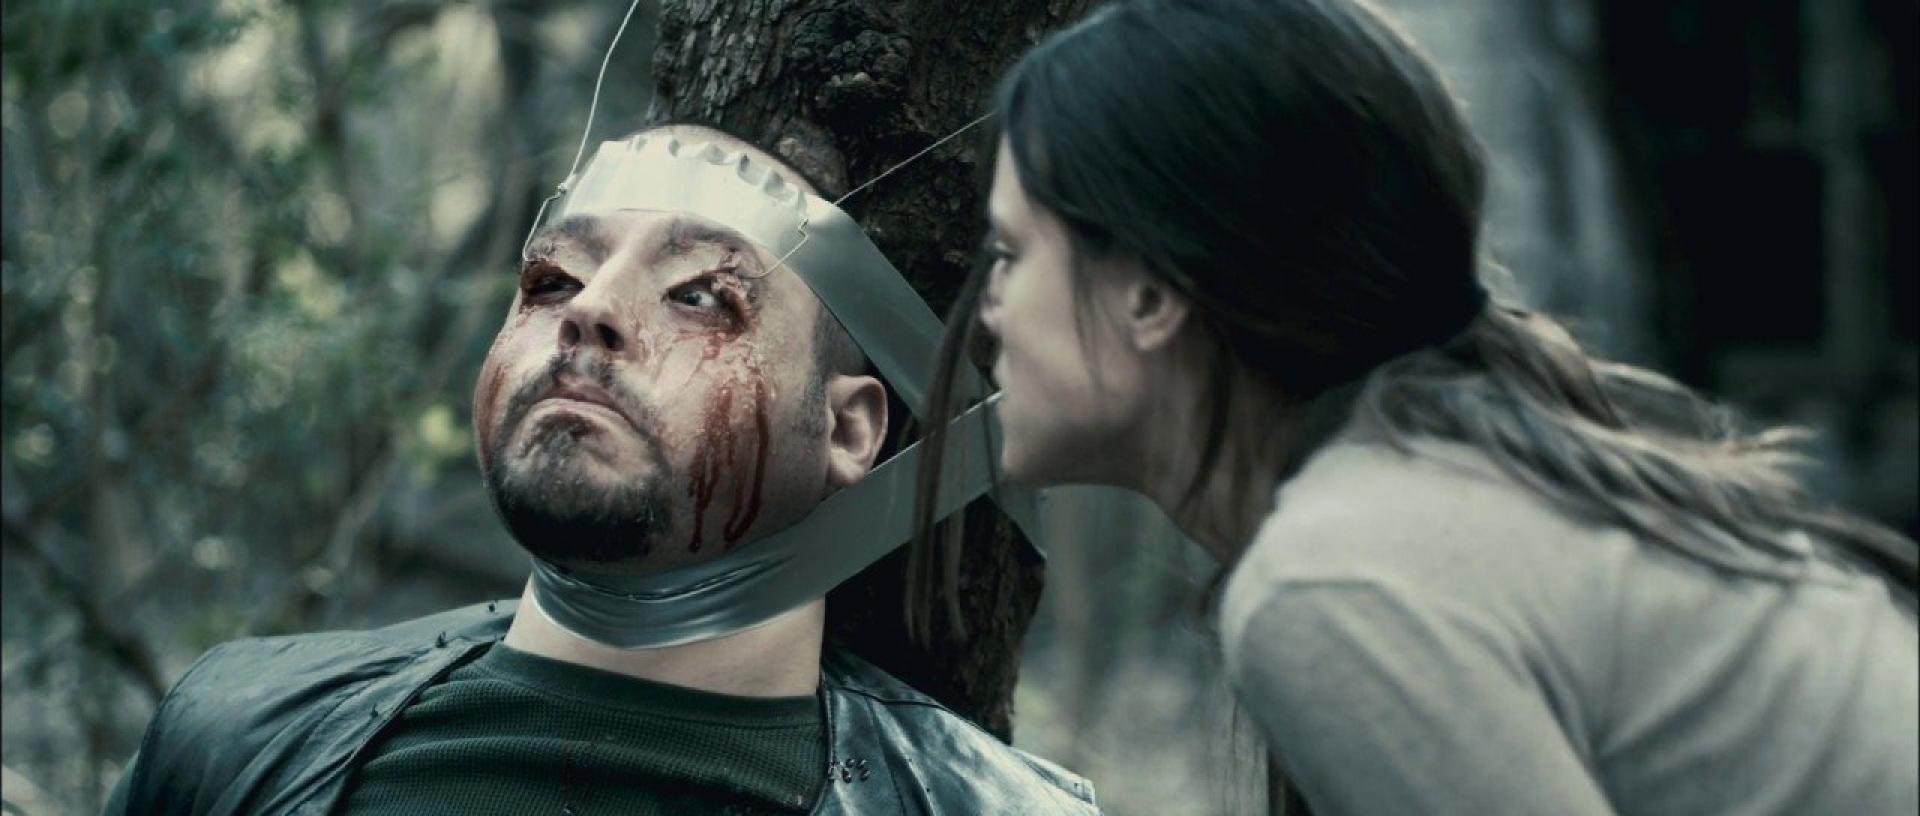 Köpök a sírodra (2010)